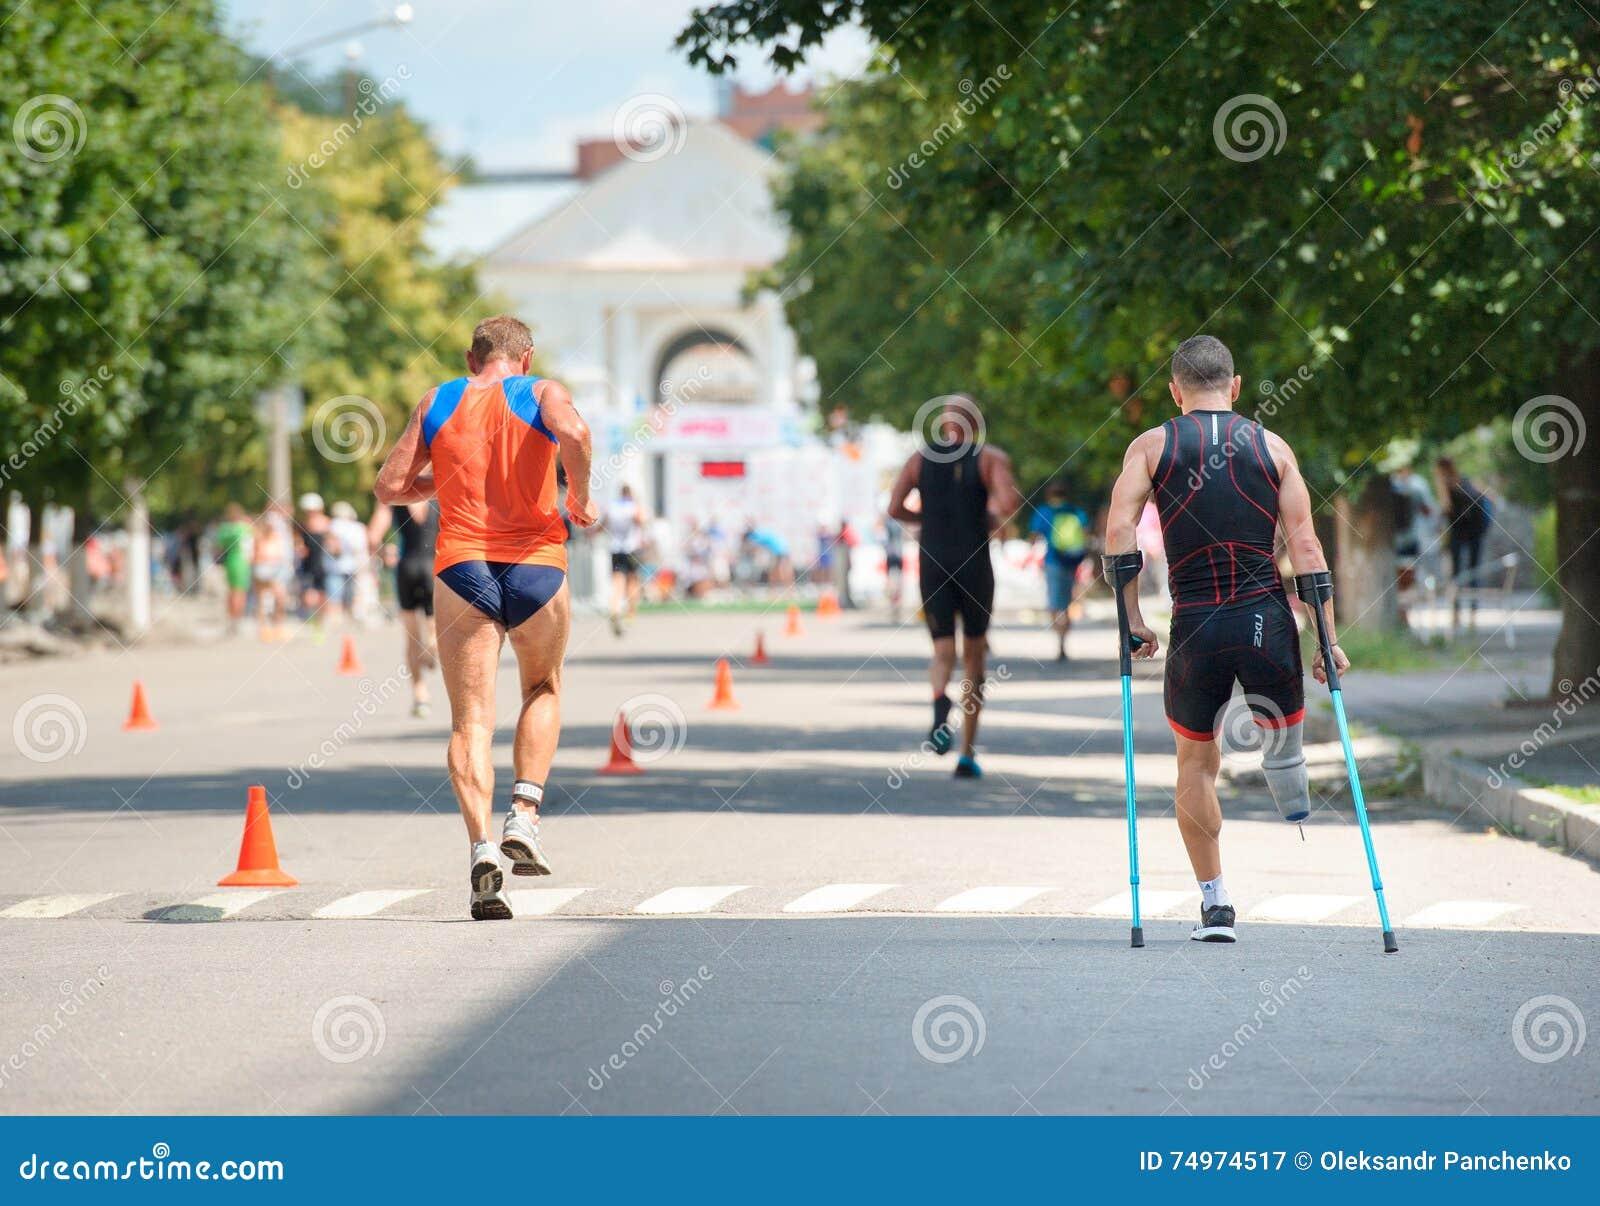 Triathlon Cup of Ukraine and Cup of Bila Tserkva. July 24, 2016